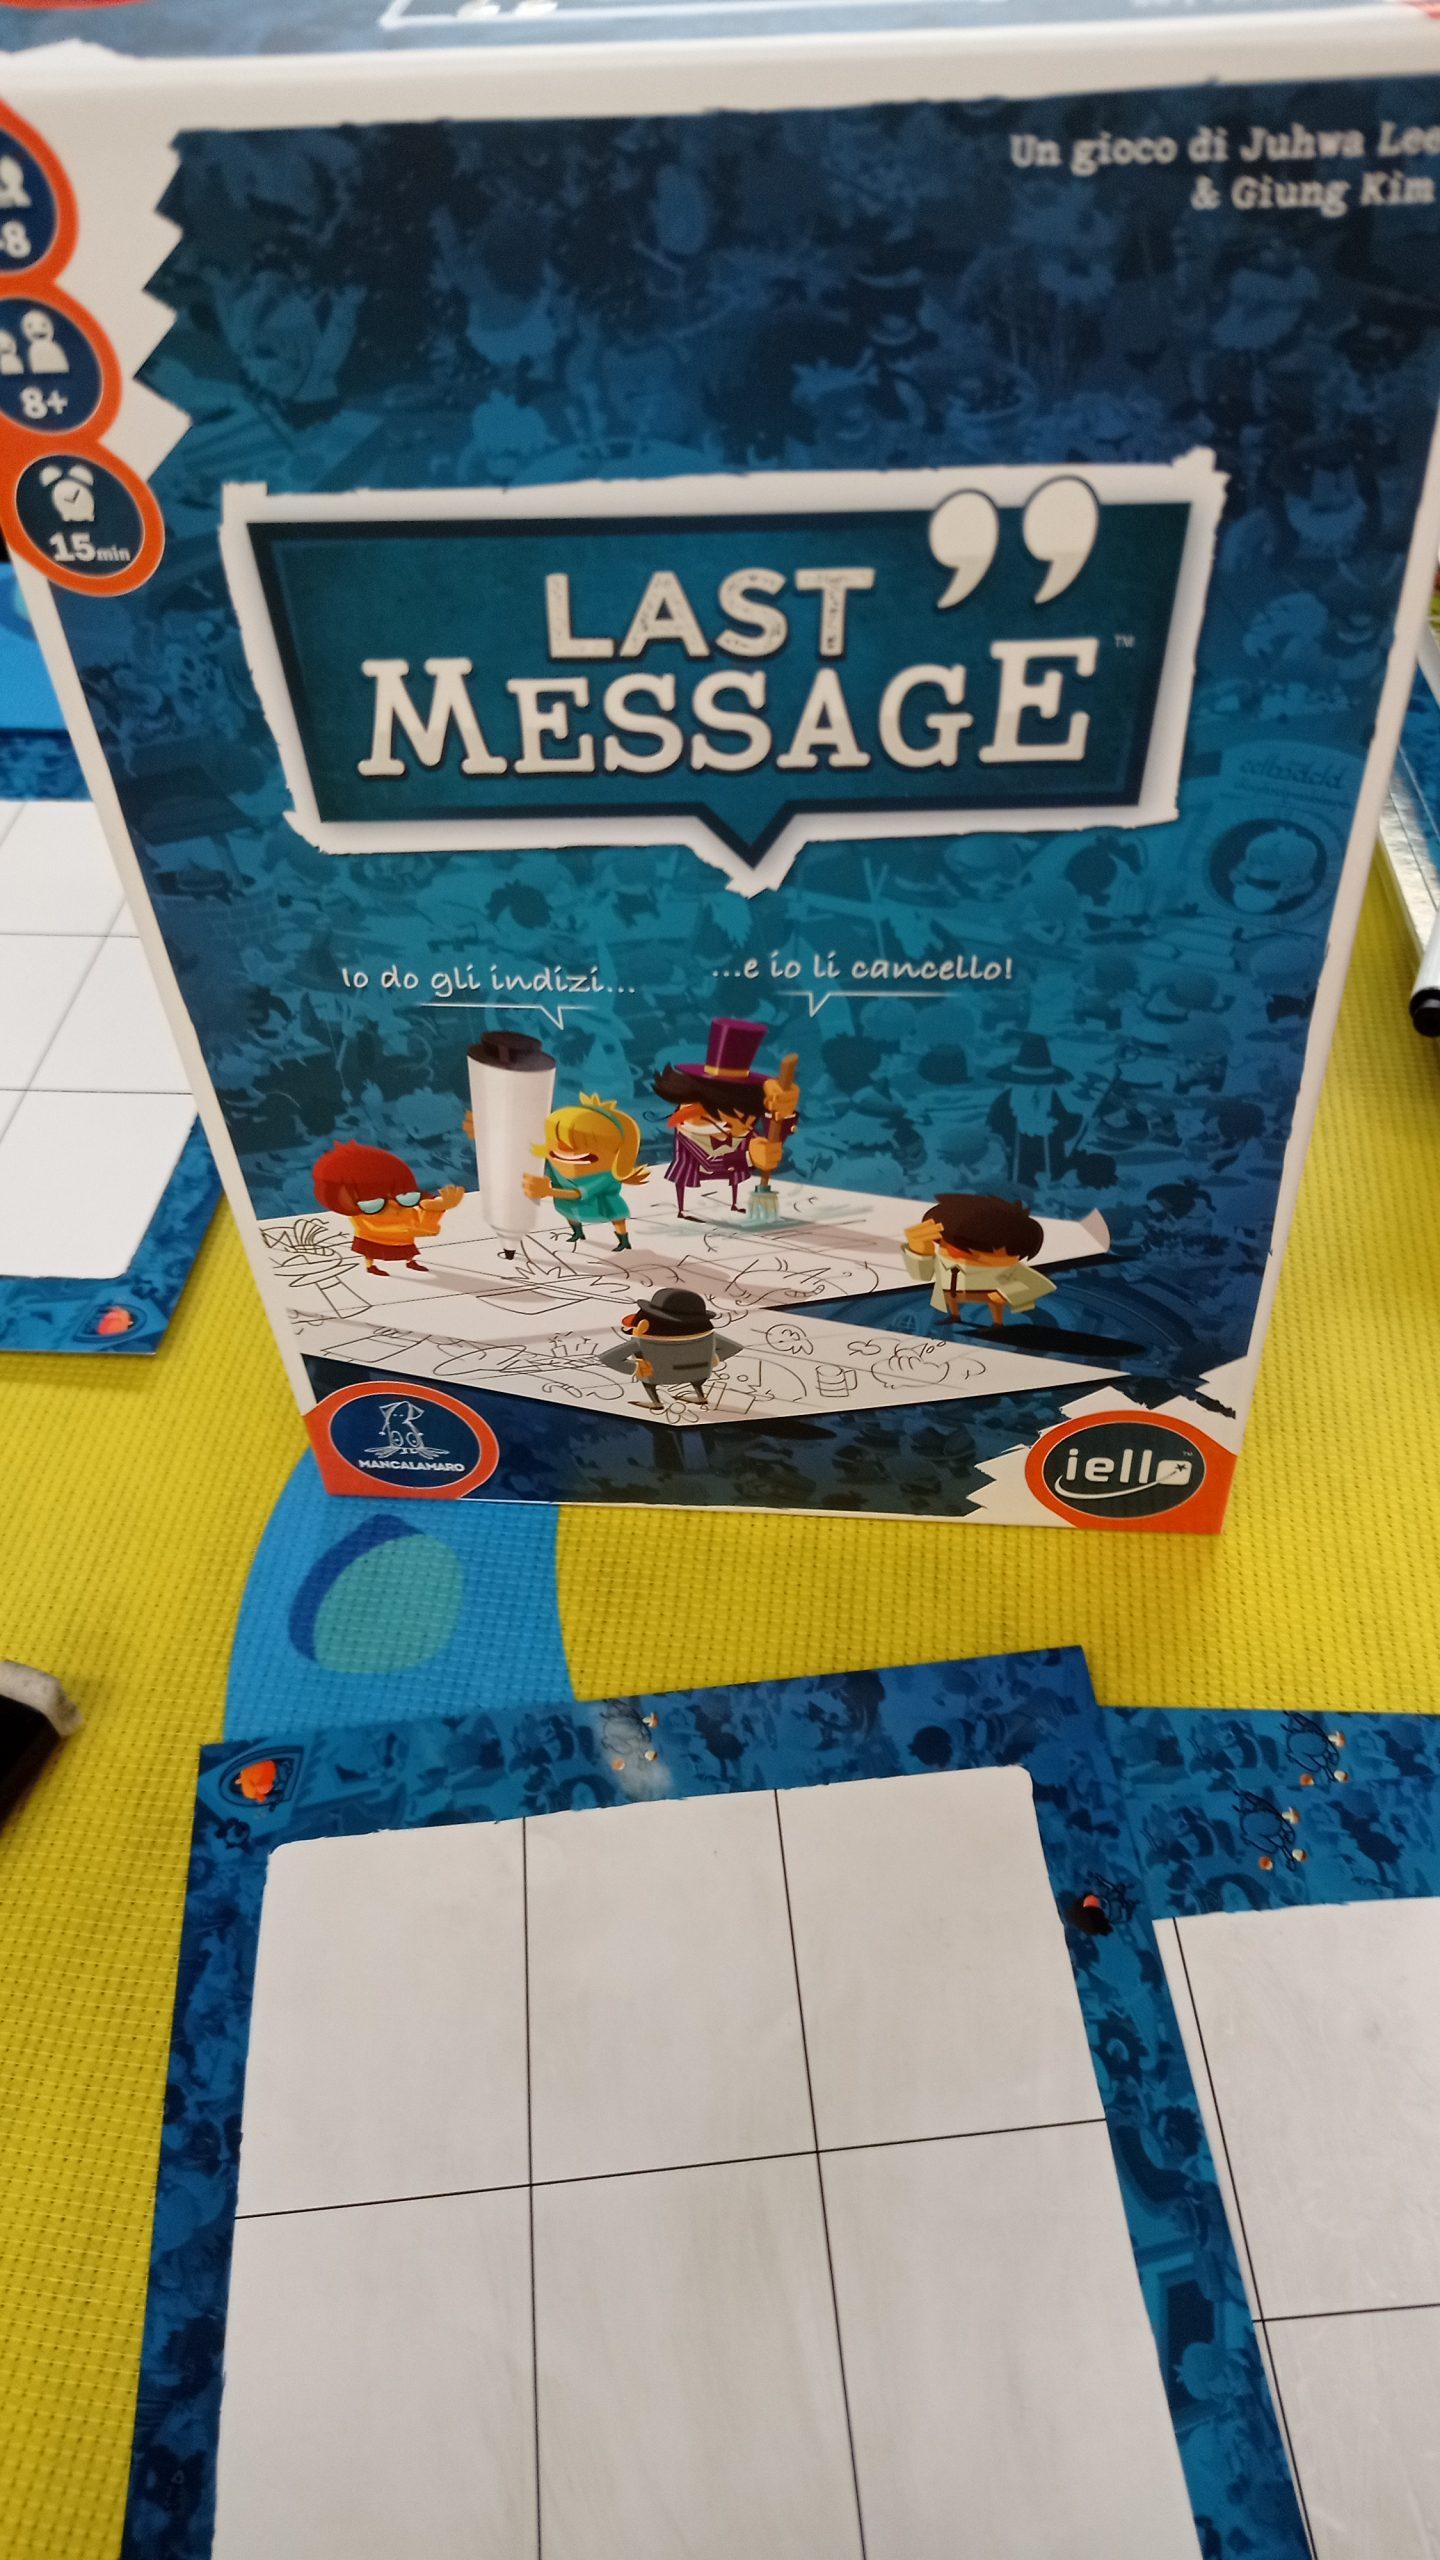 Mancalamaro: Last Message